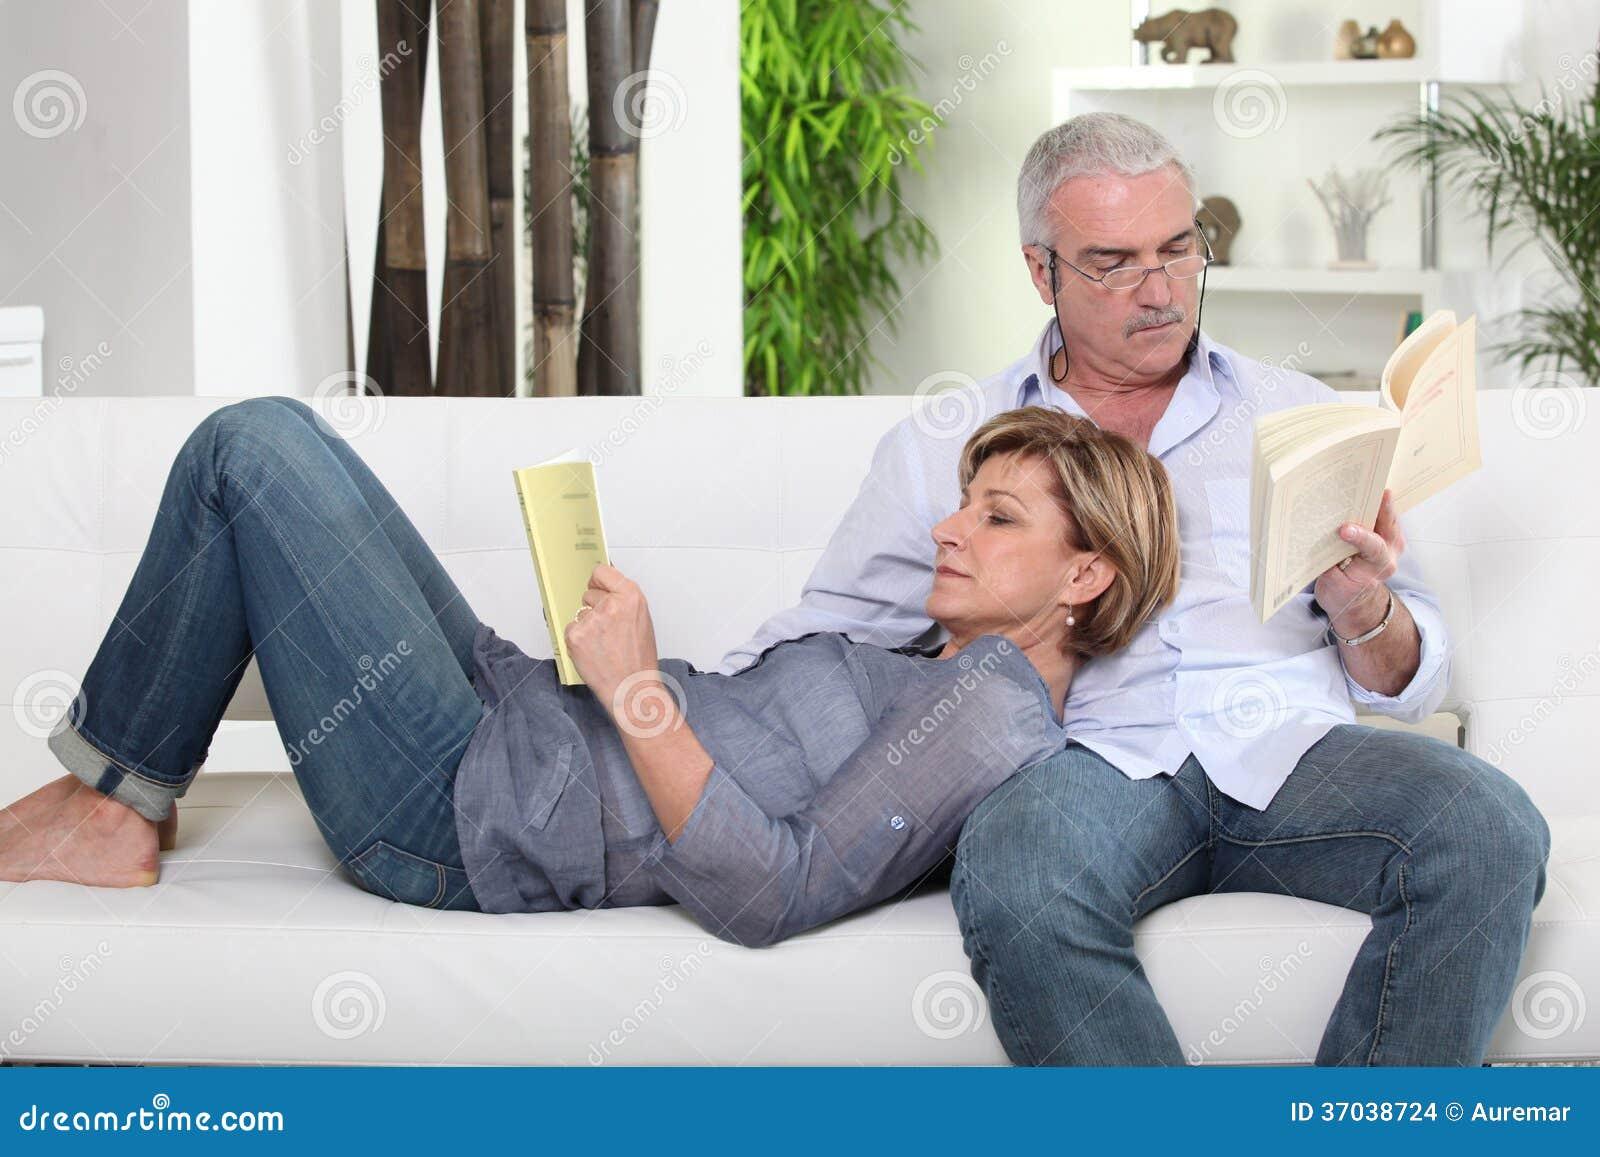 Couple Reading Stock Photo Image Of Pair, Older, Naked -3670